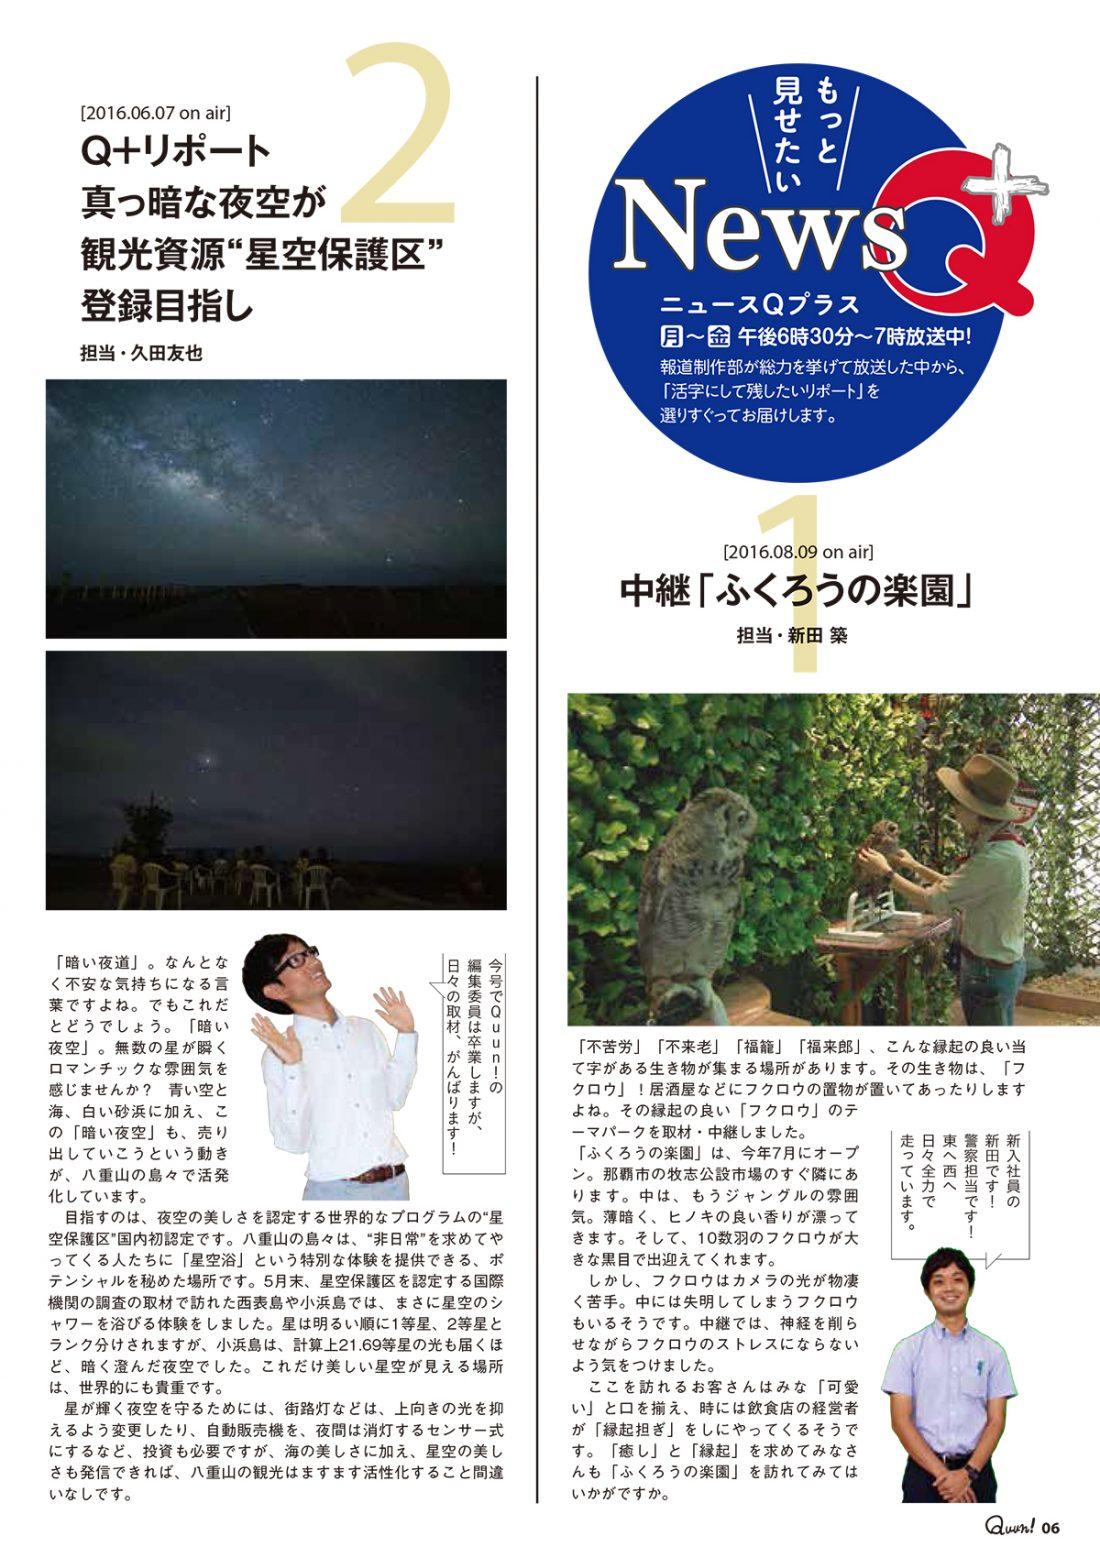 https://www.qab.co.jp/qgoro/wp-content/uploads/quun_0608-1100x1558.jpg